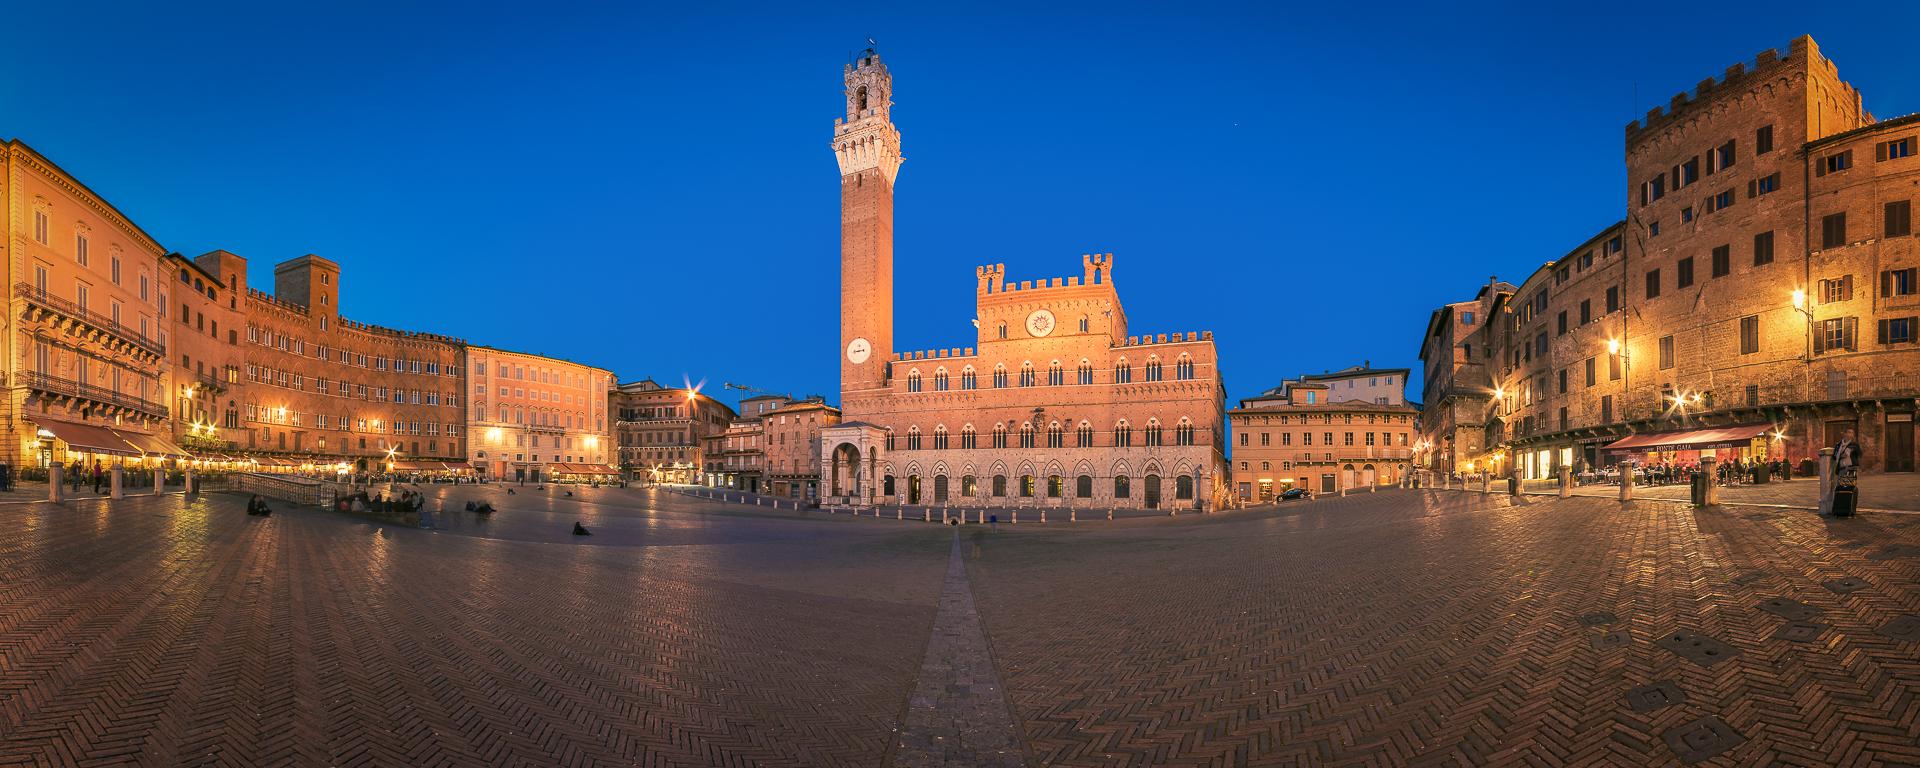 Italy, Tuscany, Siena, Panorama, Blue Hour, 2014